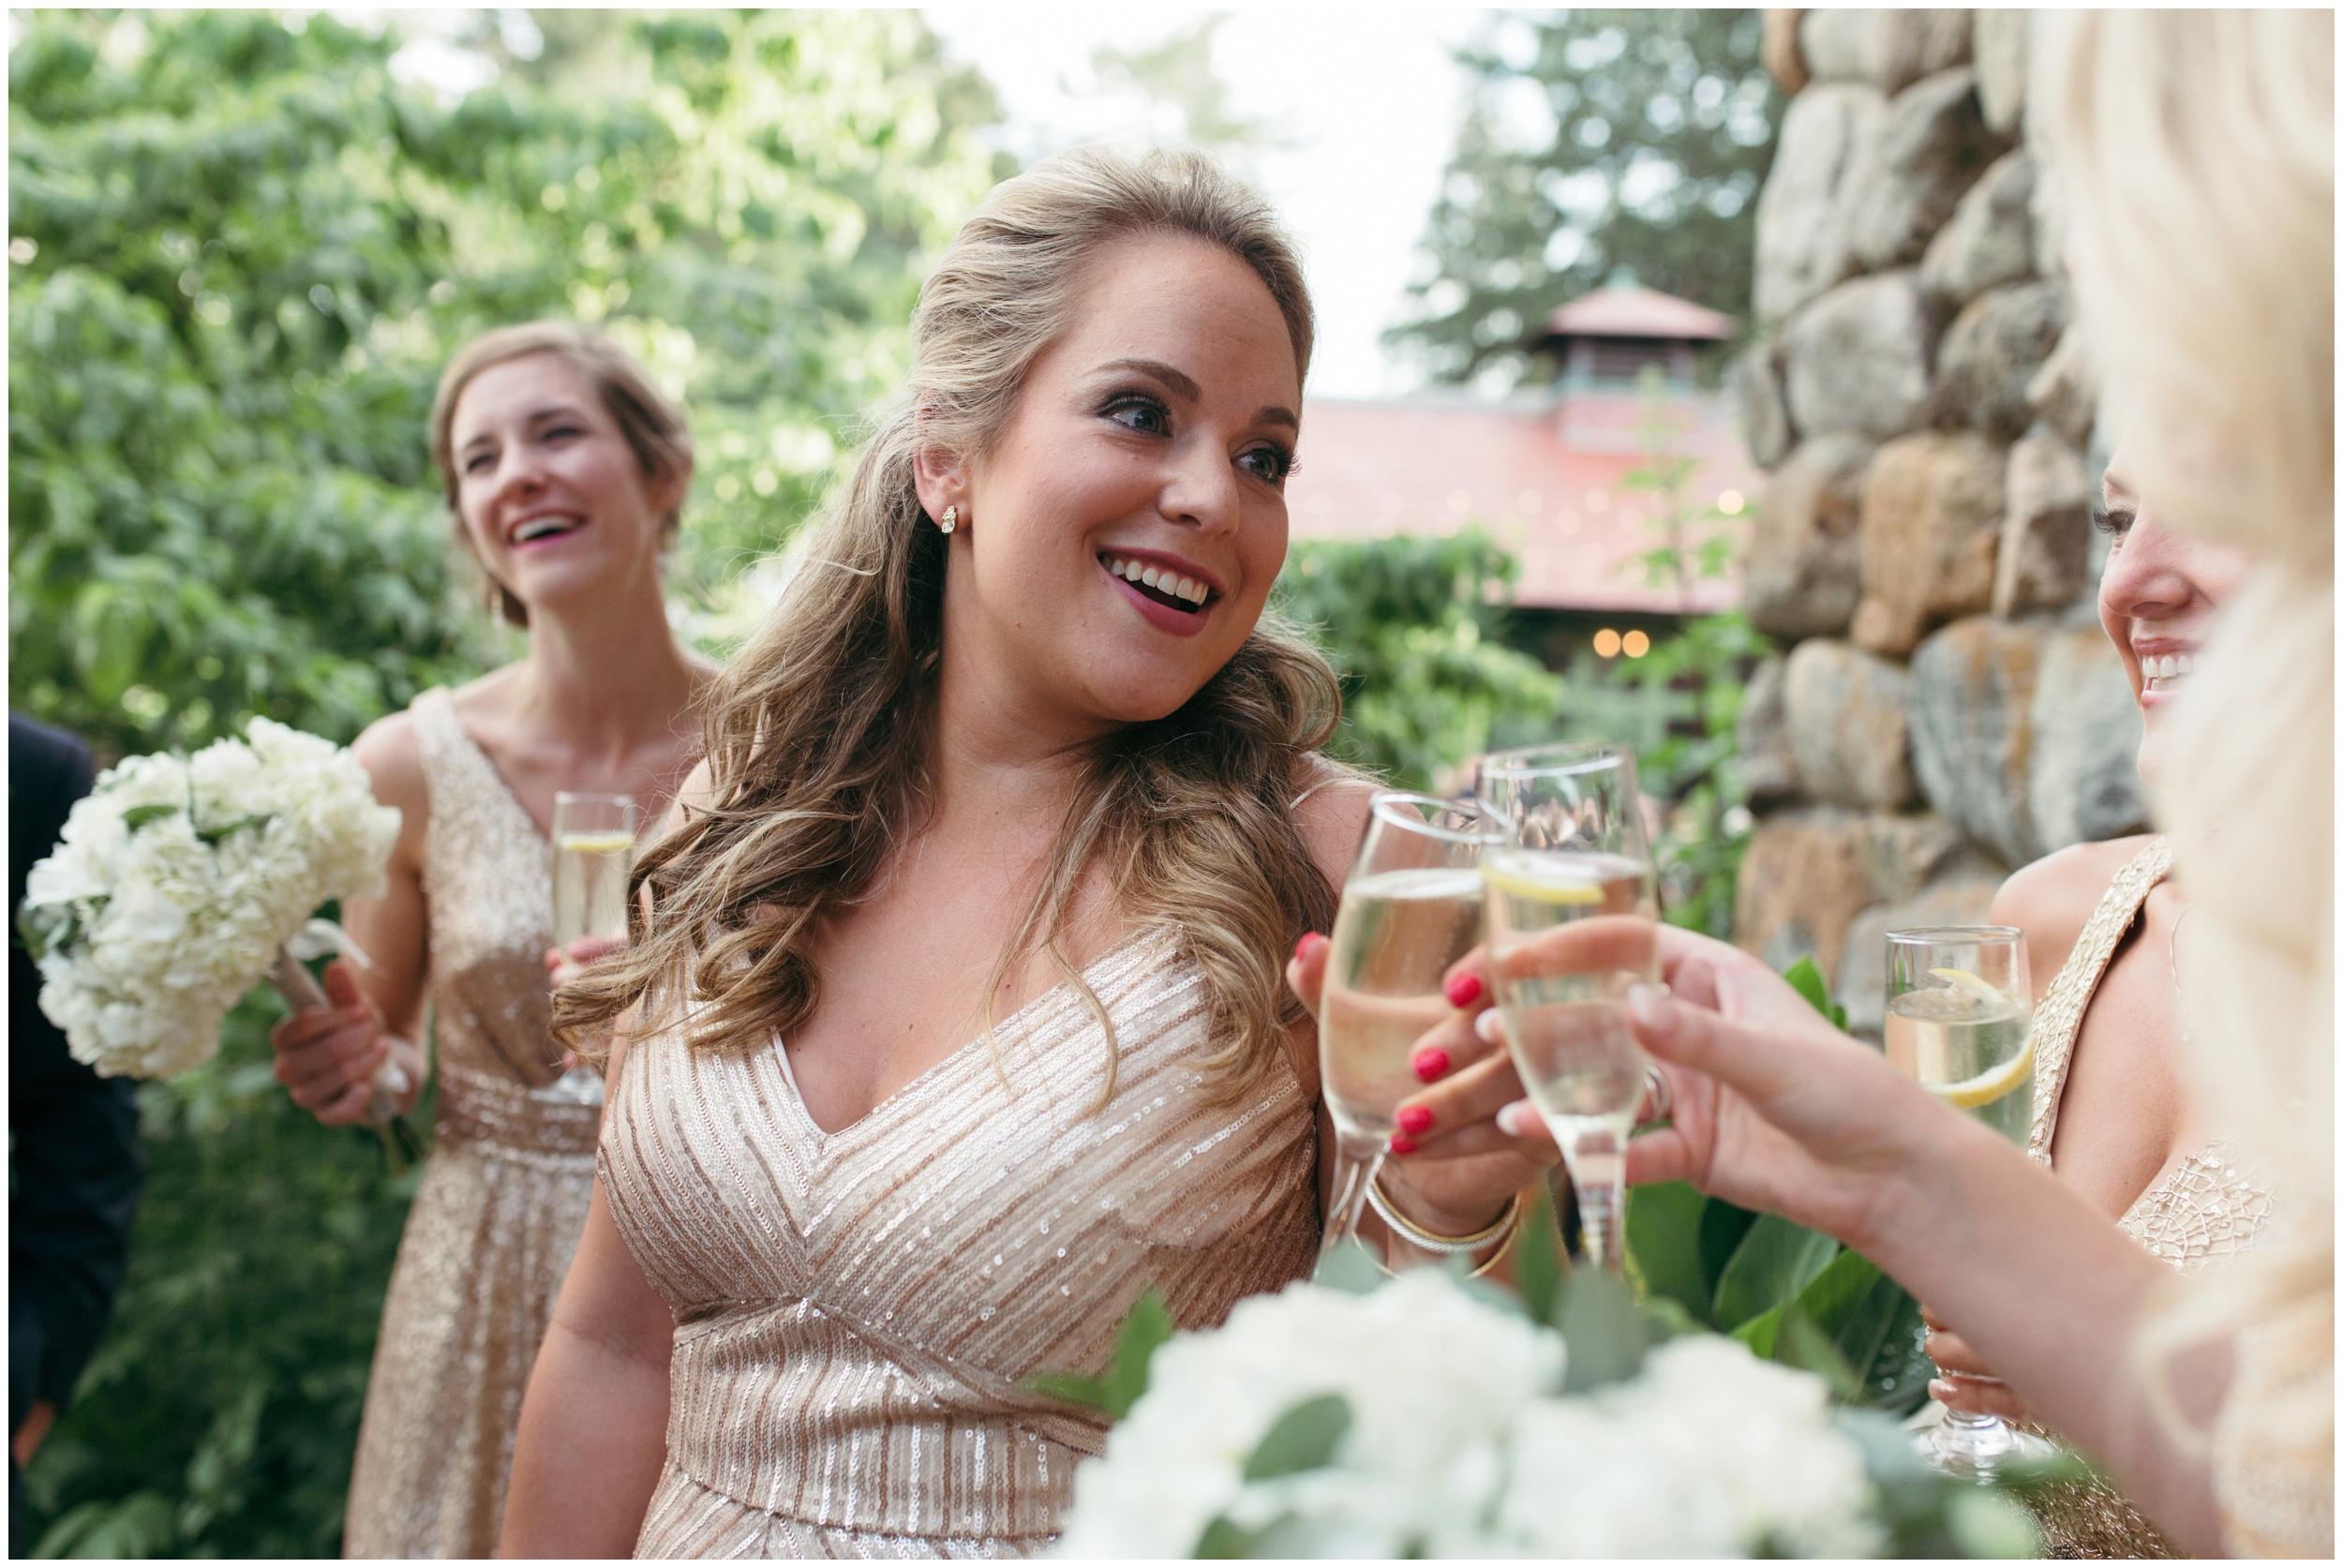 Willowdale-Estate-Wedding-Bailey-Q-Photo-Boston-Wedding-Photographer-048.JPG